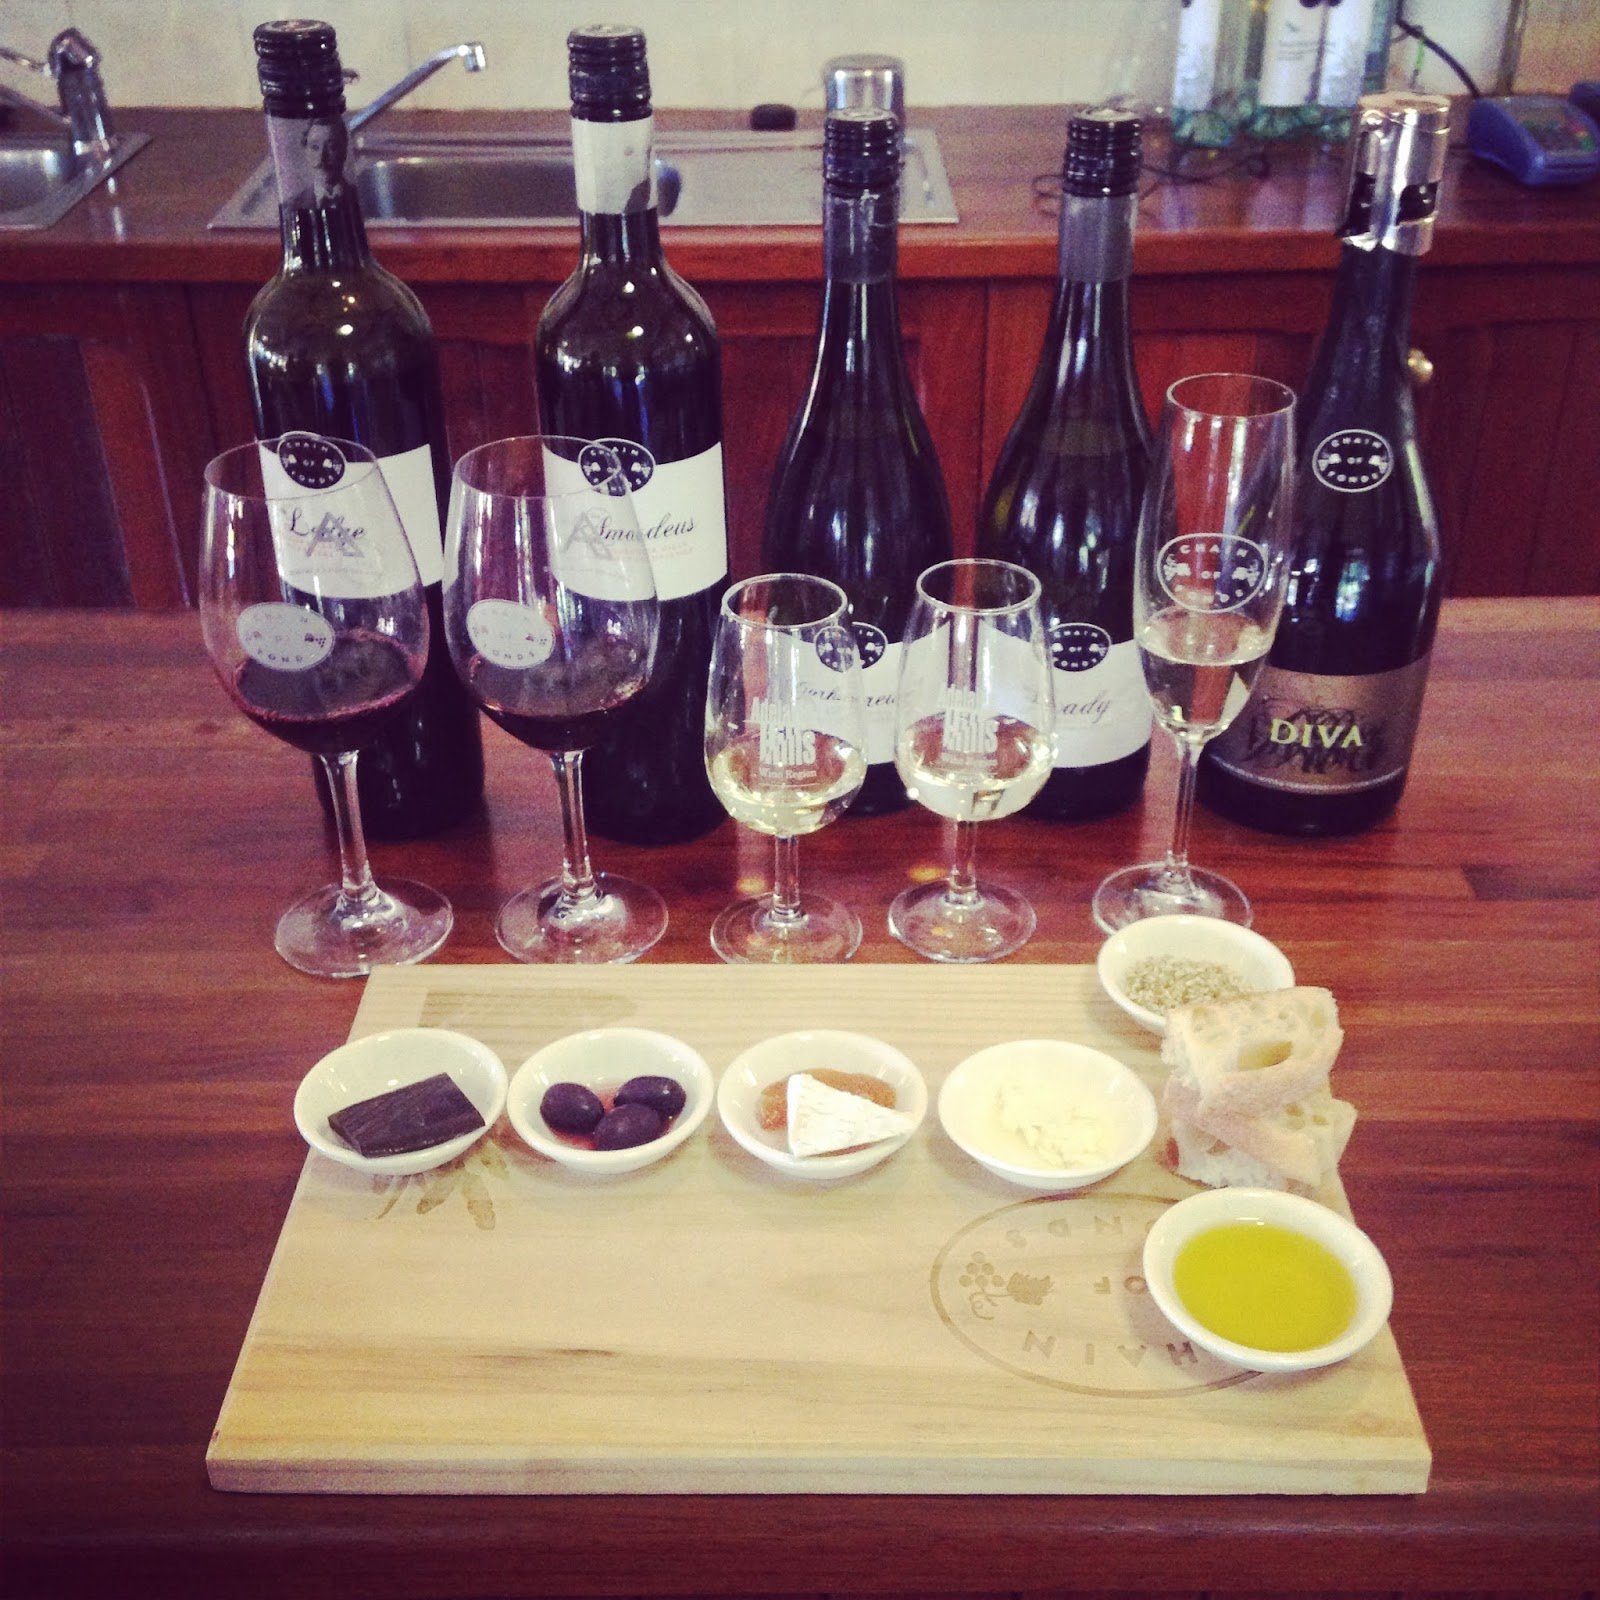 Cabernet Sauvignon, Chain of Ponds, Chardonnay, Gumeracha, Red Wine, SA Wine, Sauvignon Blanc, Shiraz, Tribute Wine Flight, White Wine, Wine, Winery,